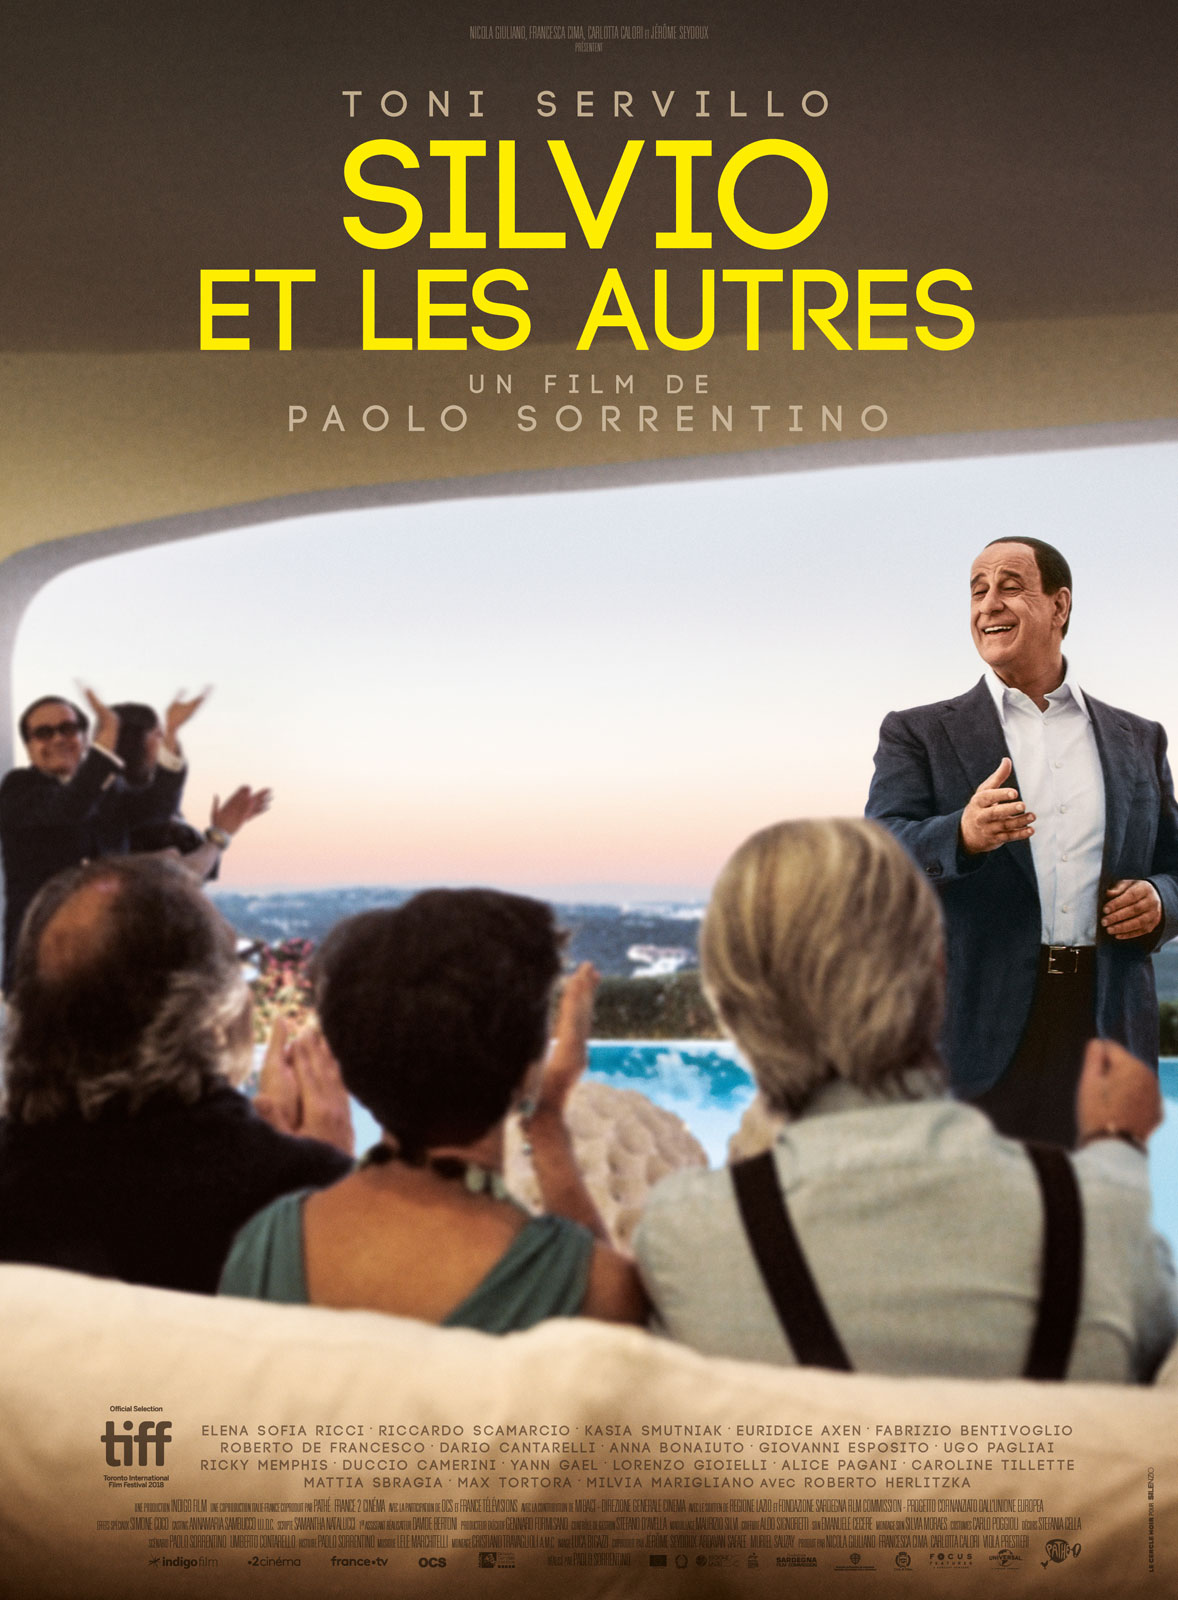 Silvio et les autres affiche film paolo sorrentino